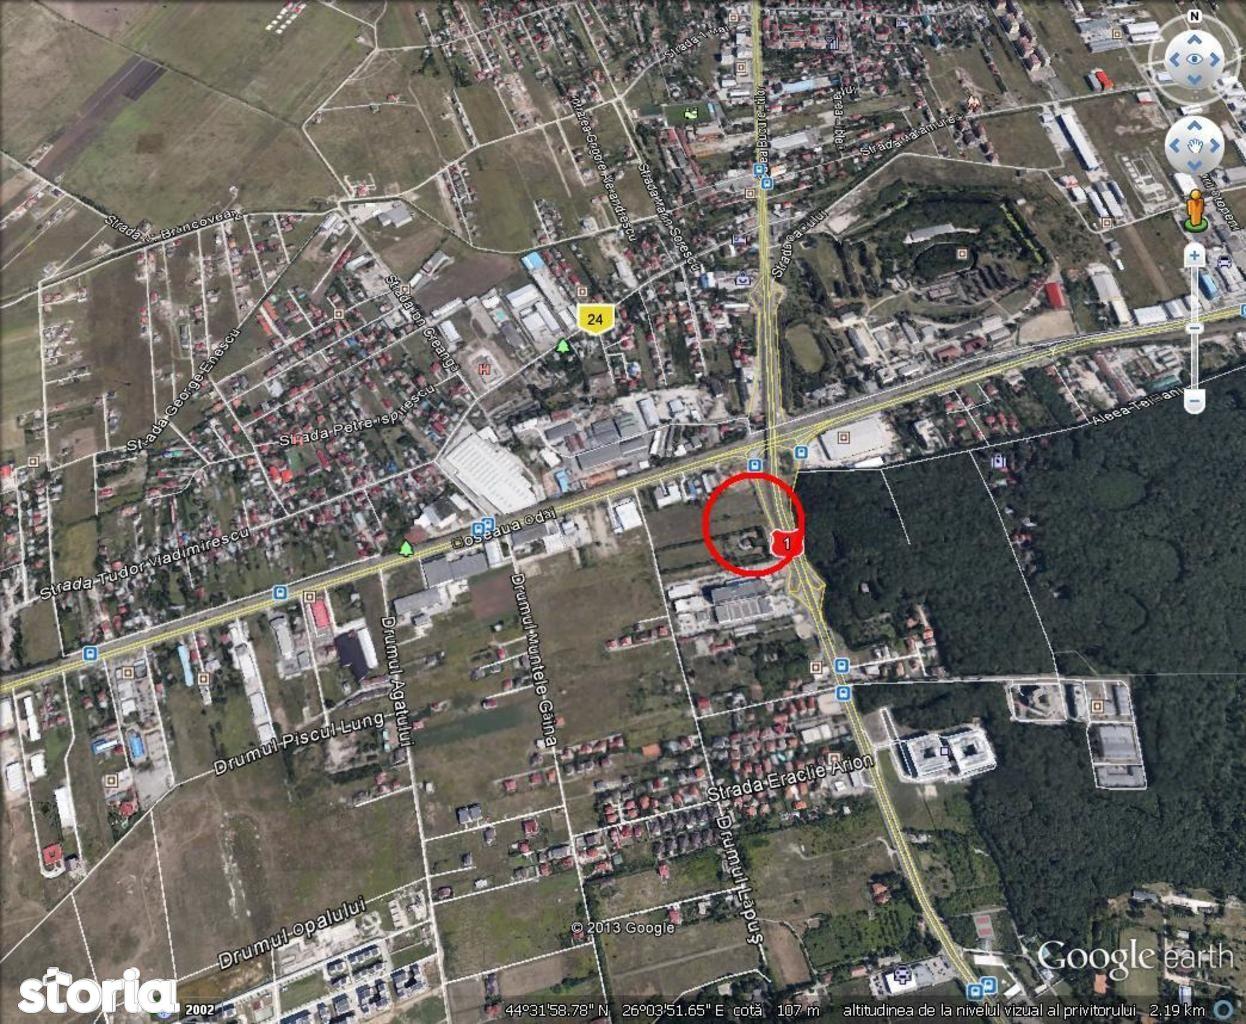 Teren de vanzare Baneasa , Bucuresti-Ploiesti